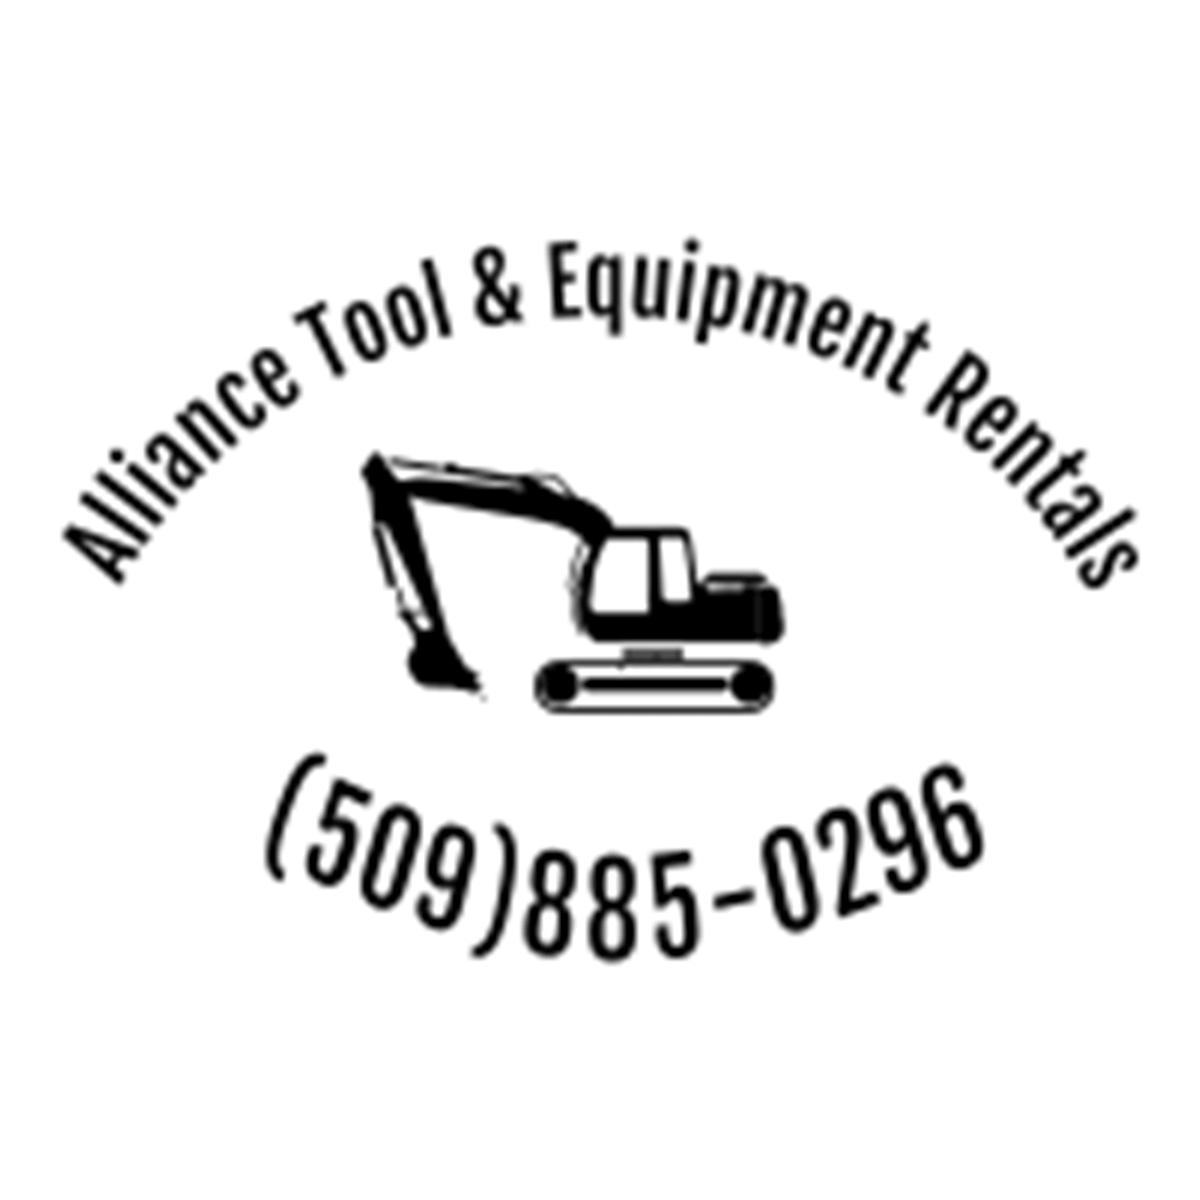 Alliance Tool & Equipment Rentals logo